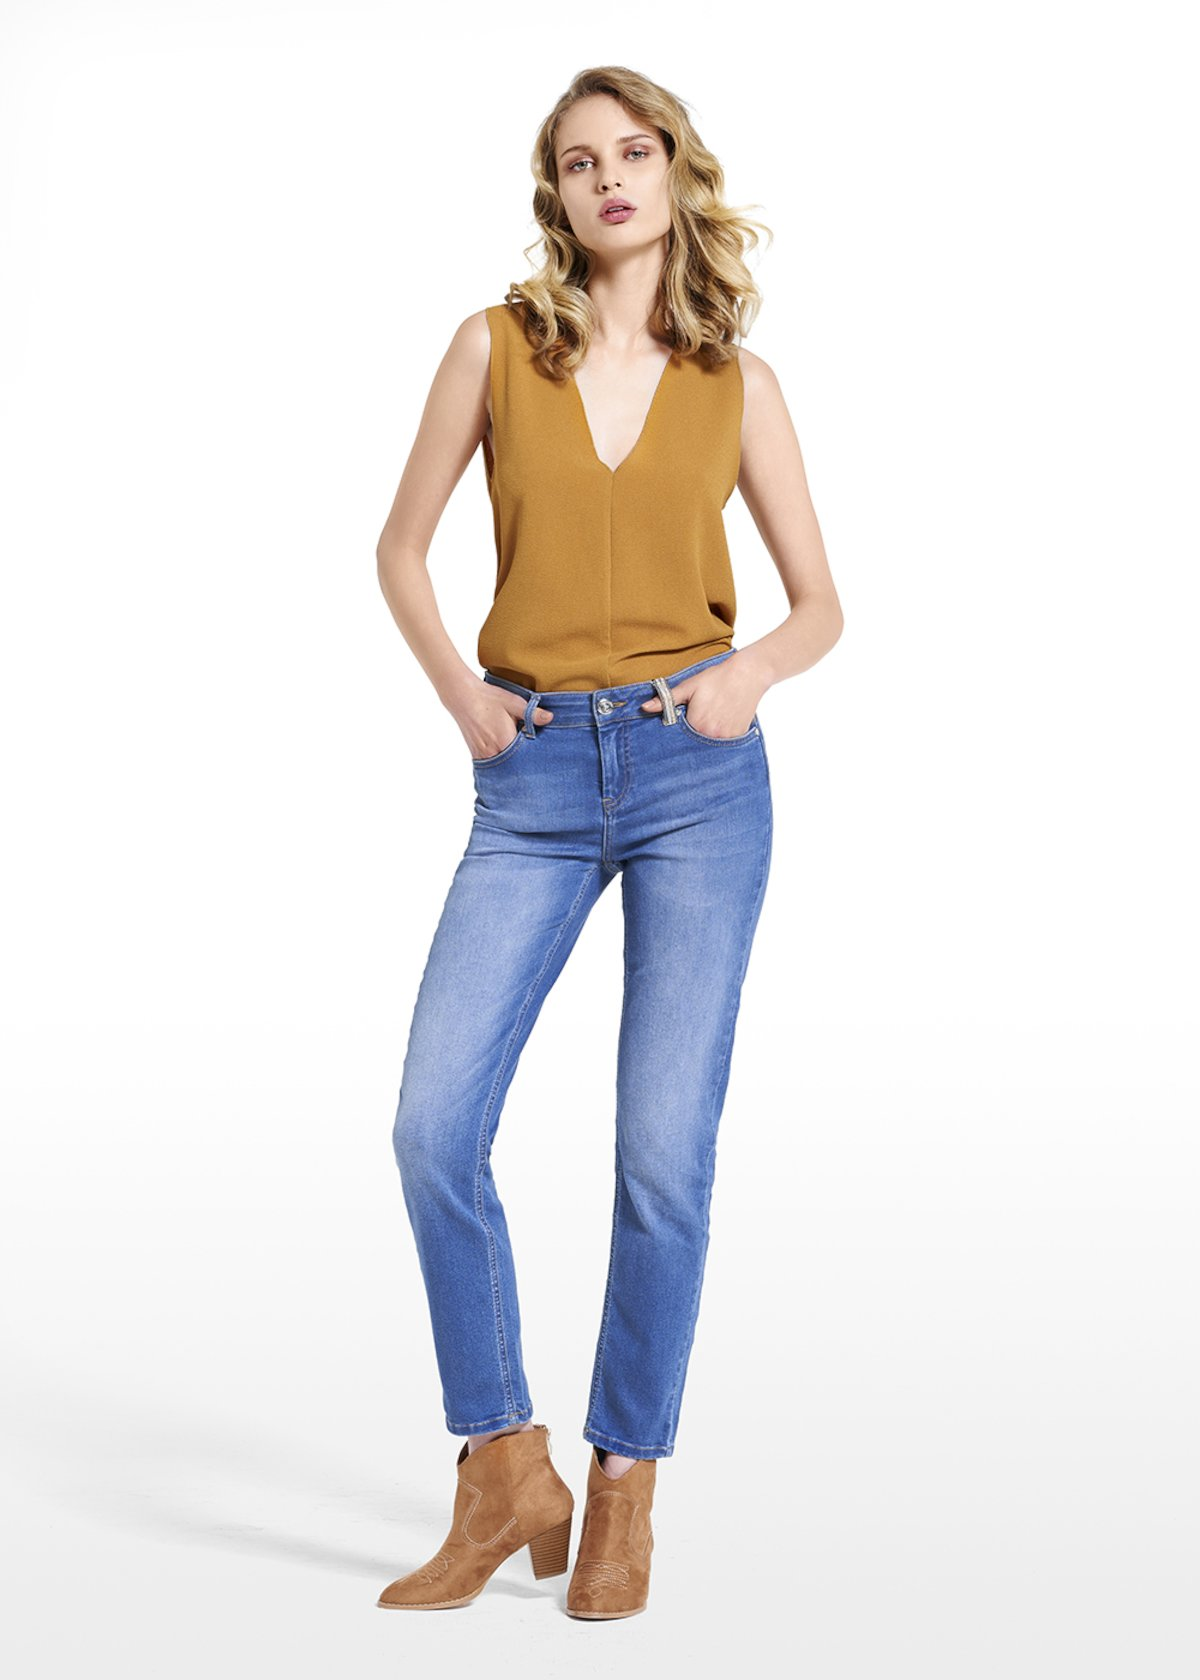 Jeans Donny with lurex detail - Medium Denim - Woman